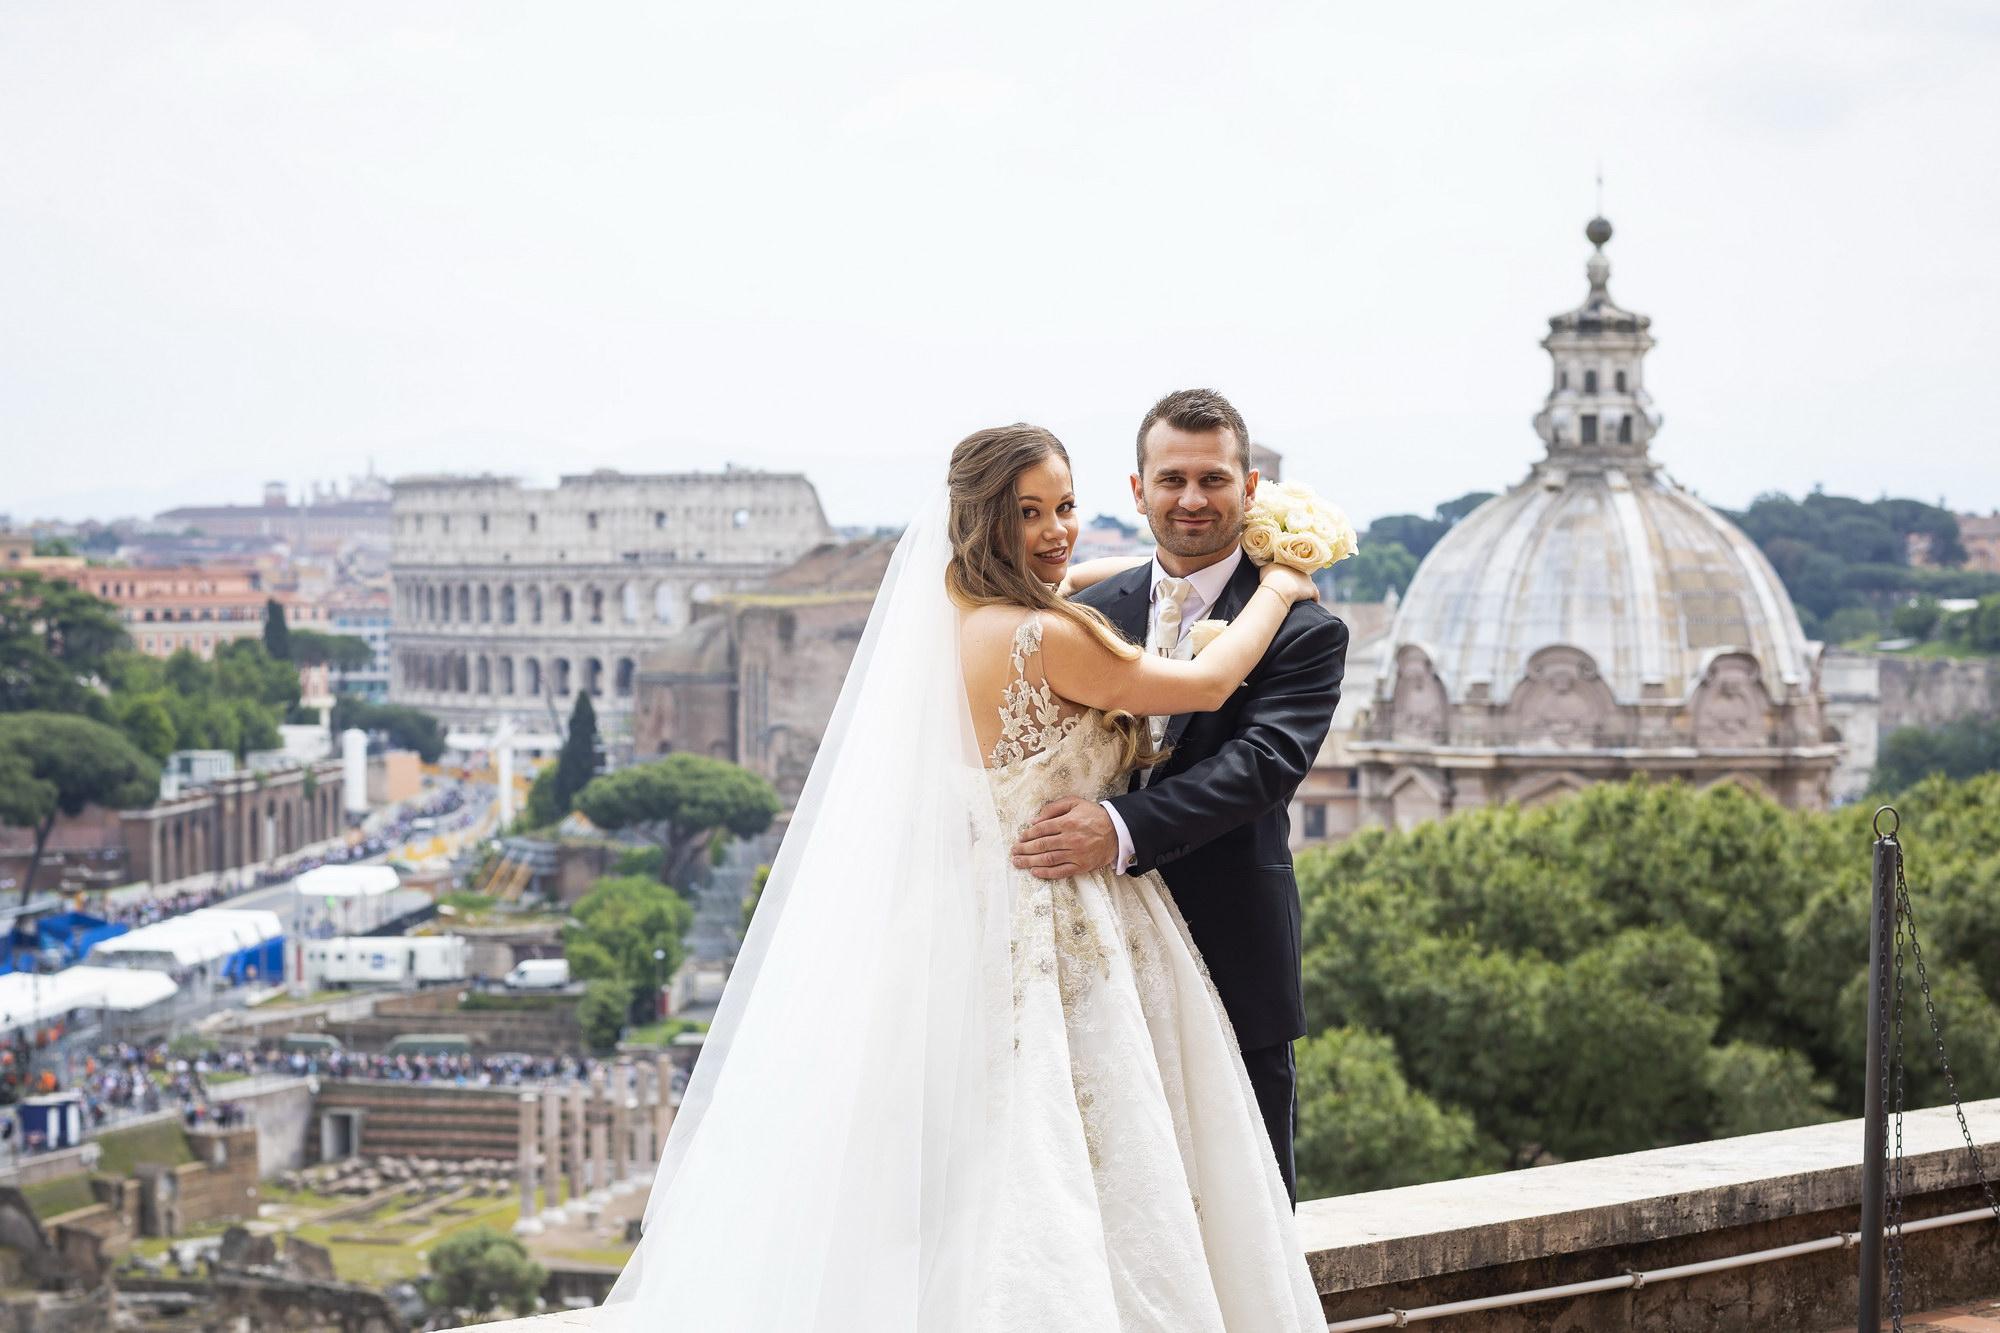 St Peters Basilica Wedding Photo